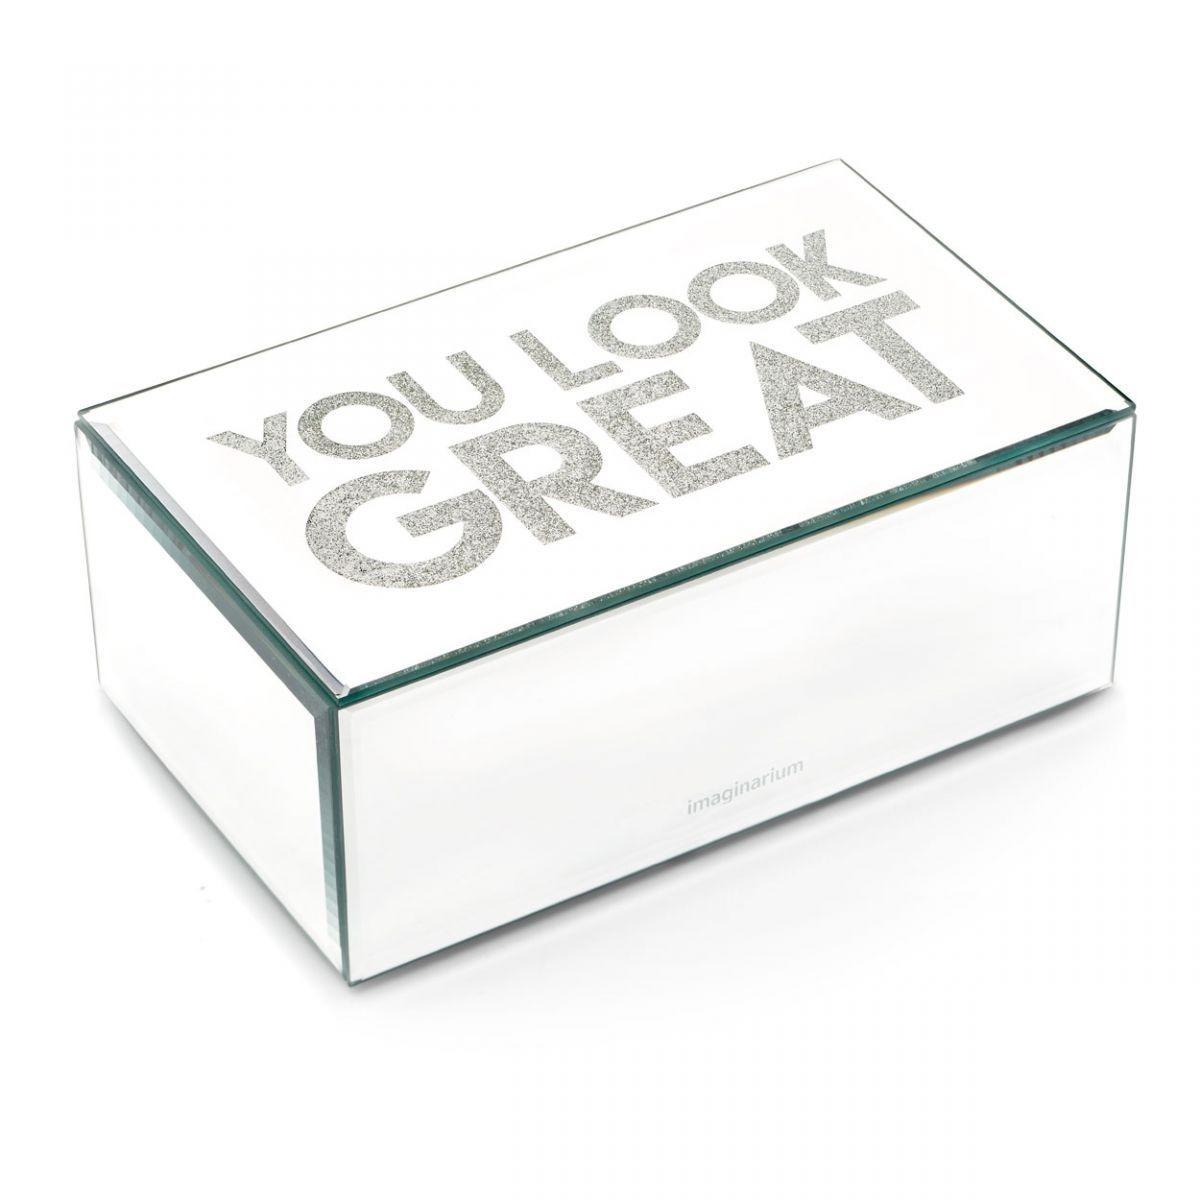 6982d160e Porta Bijoux Espelhado Look Great Imaginarium - R$ 119,90 em Mercado ...